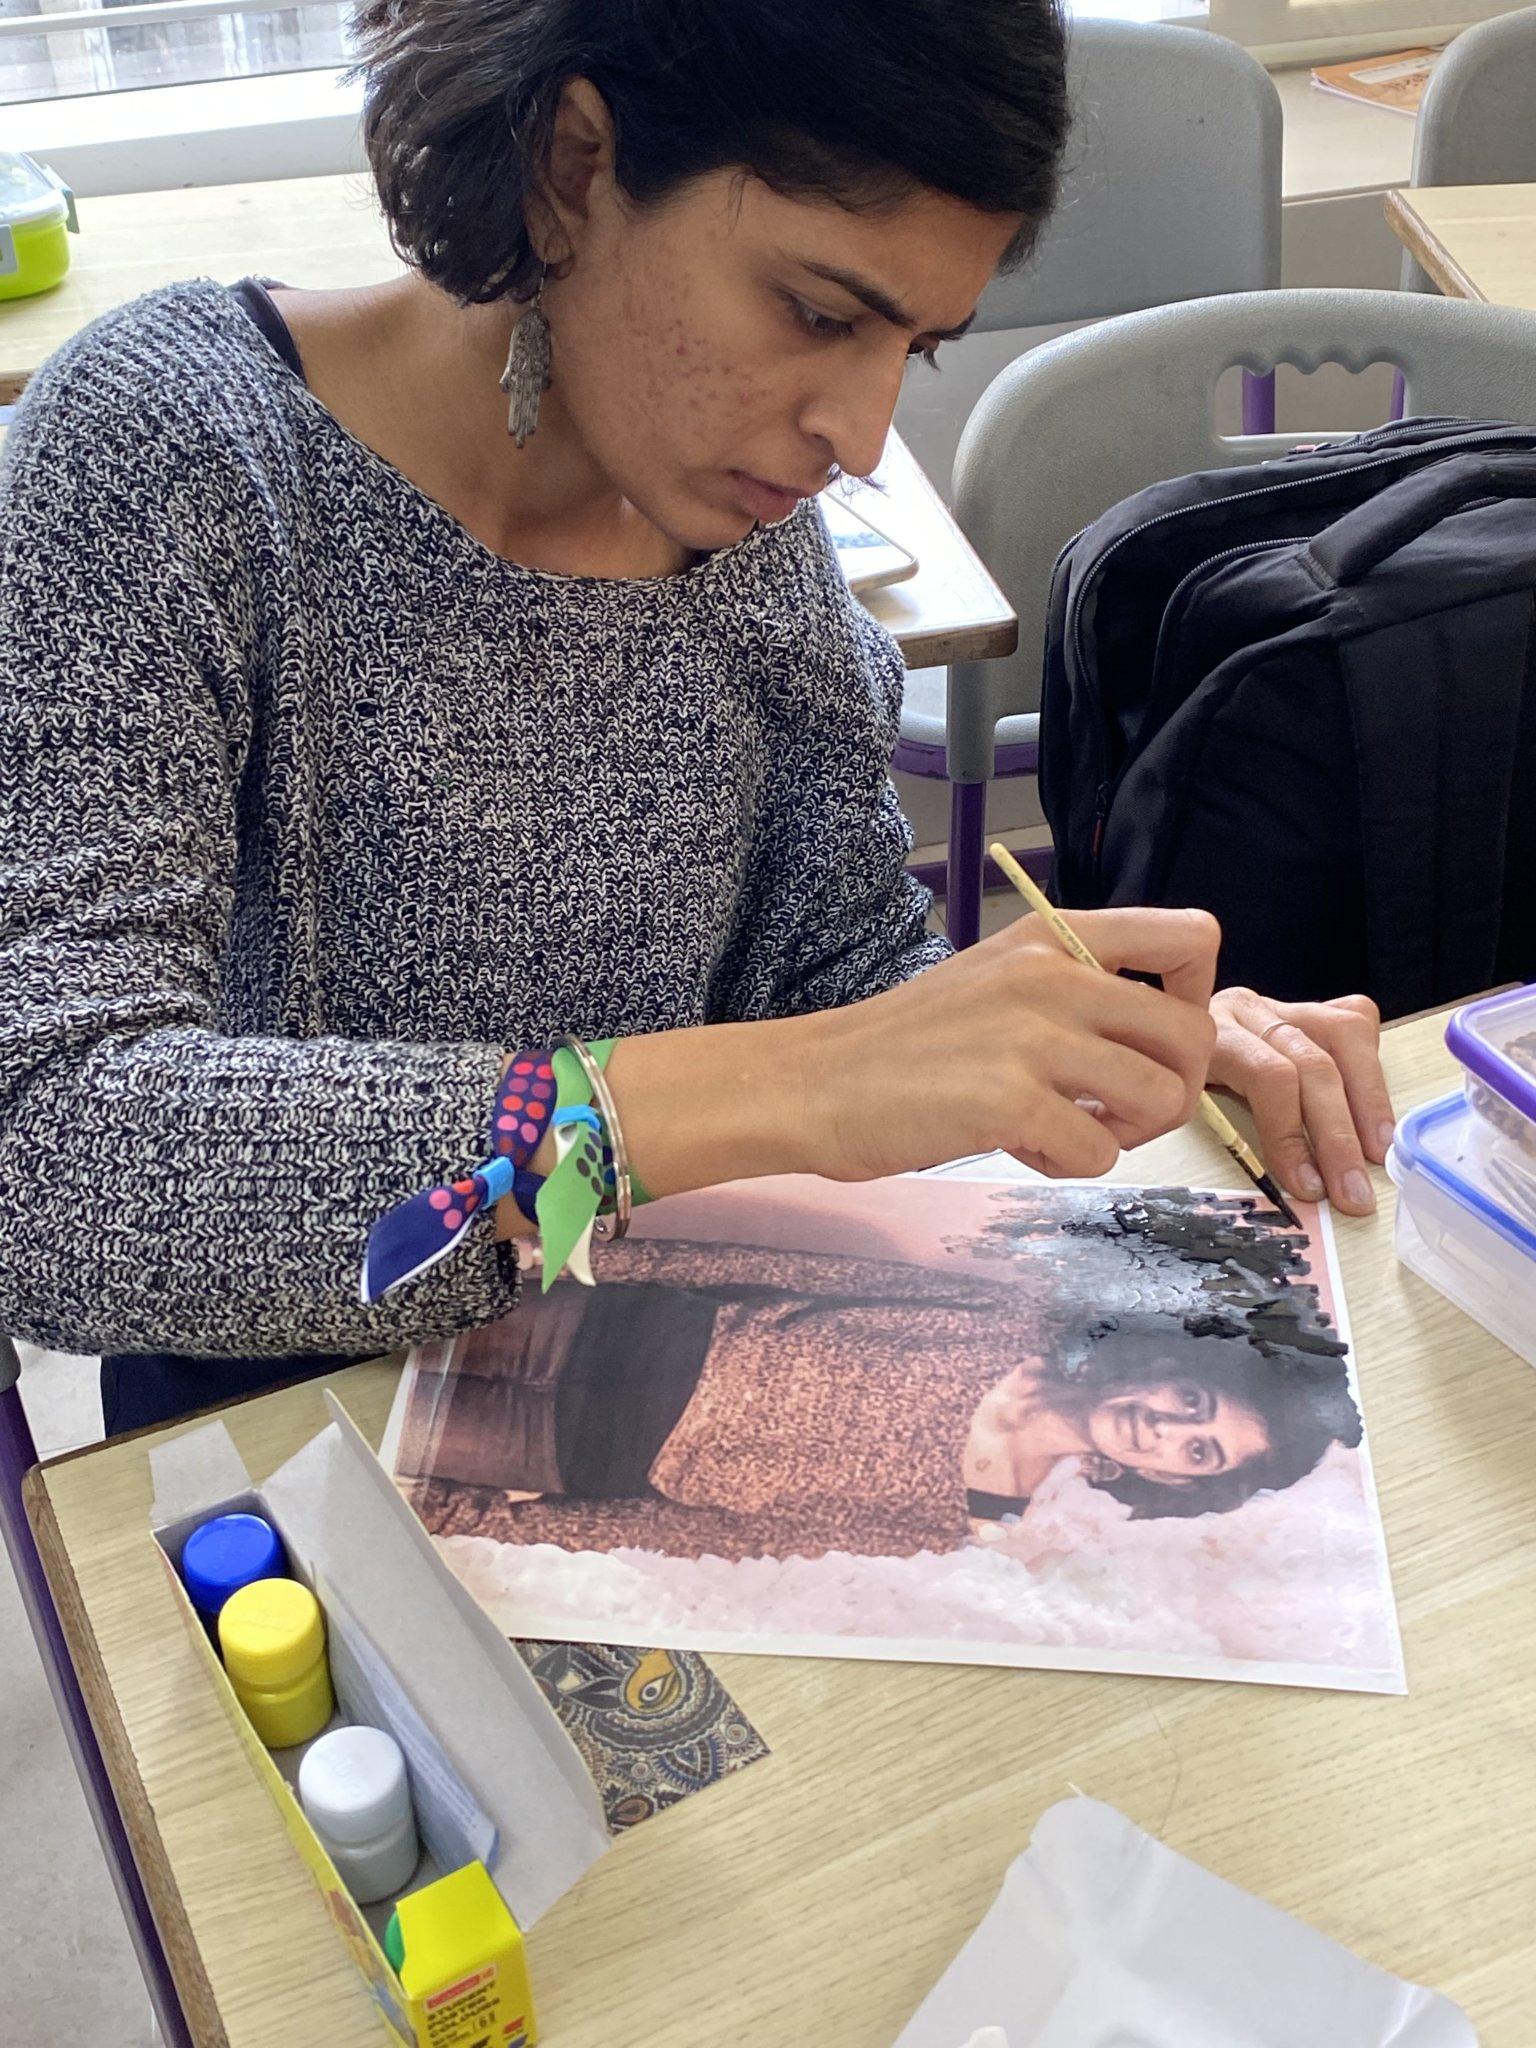 Teacher Training - Saturday Art Class - Gond and Painted Photographs - For educators, Saturday Art Class, Workshops